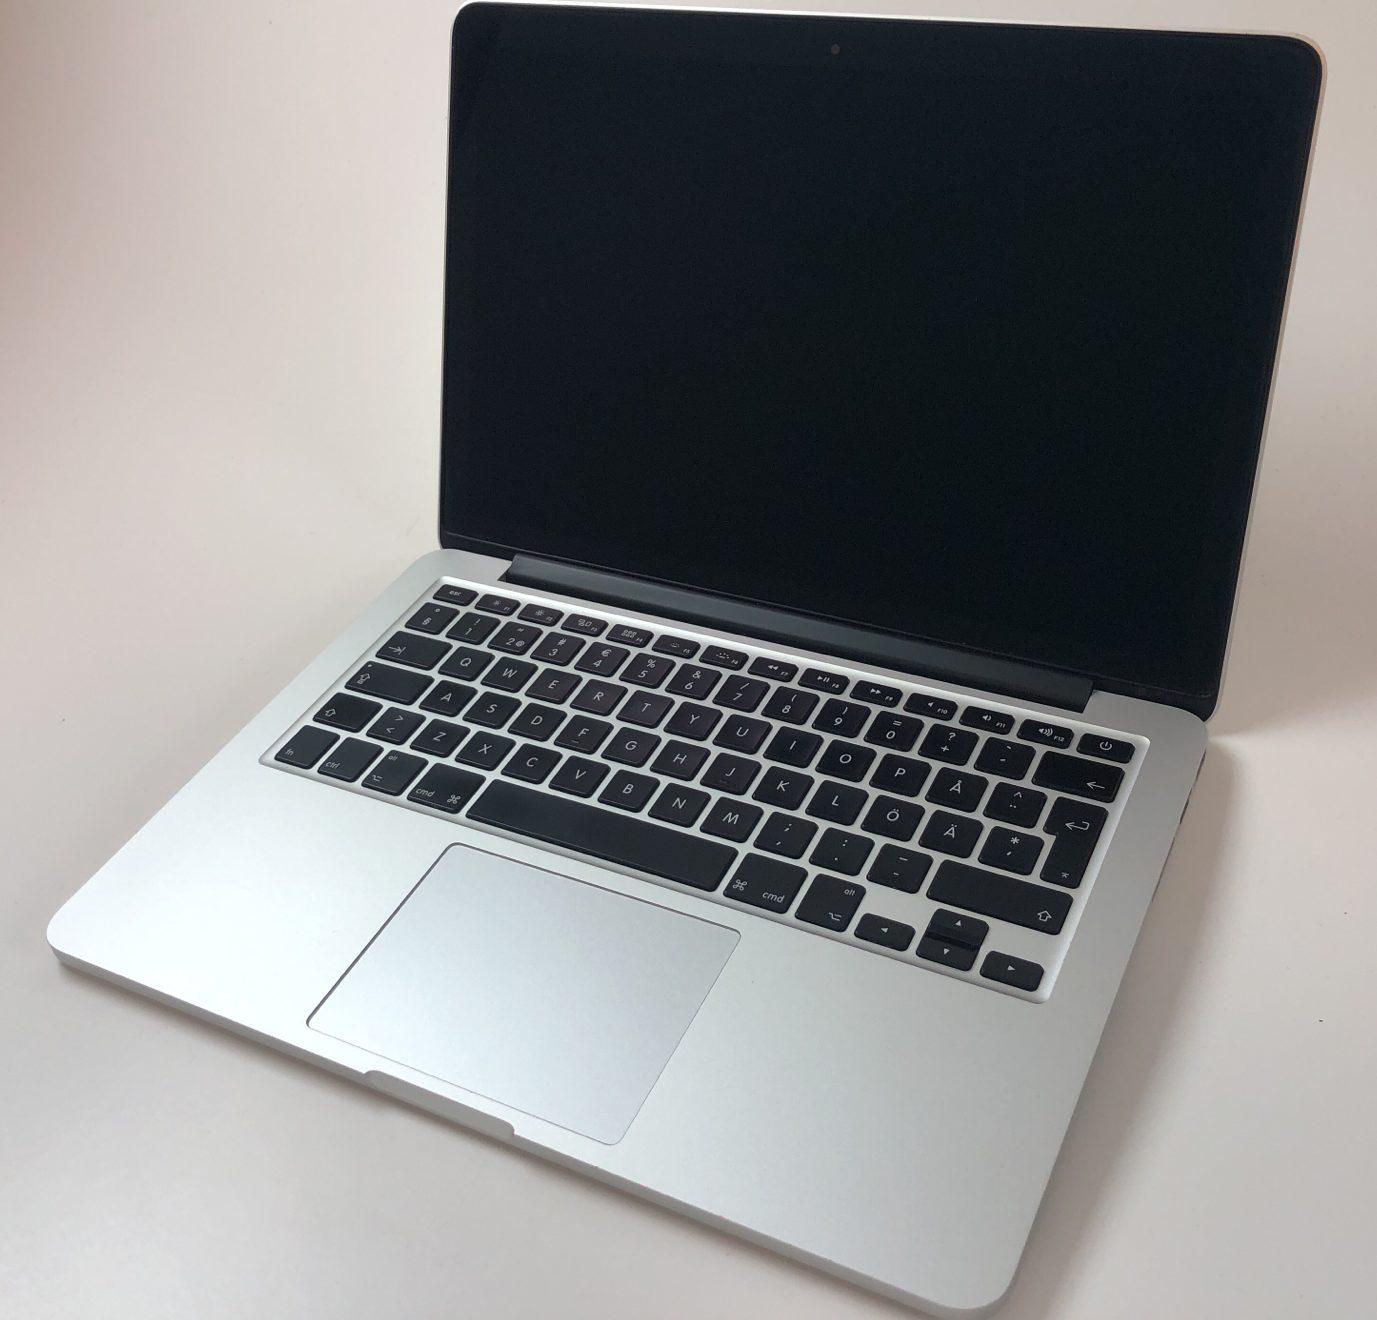 "MacBook Pro Retina 13"" Mid 2014 (Intel Core i5 2.6 GHz 16 GB RAM 128 GB SSD), Intel Core i5 2.6 GHz, 16 GB RAM, 128 GB SSD, bild 1"